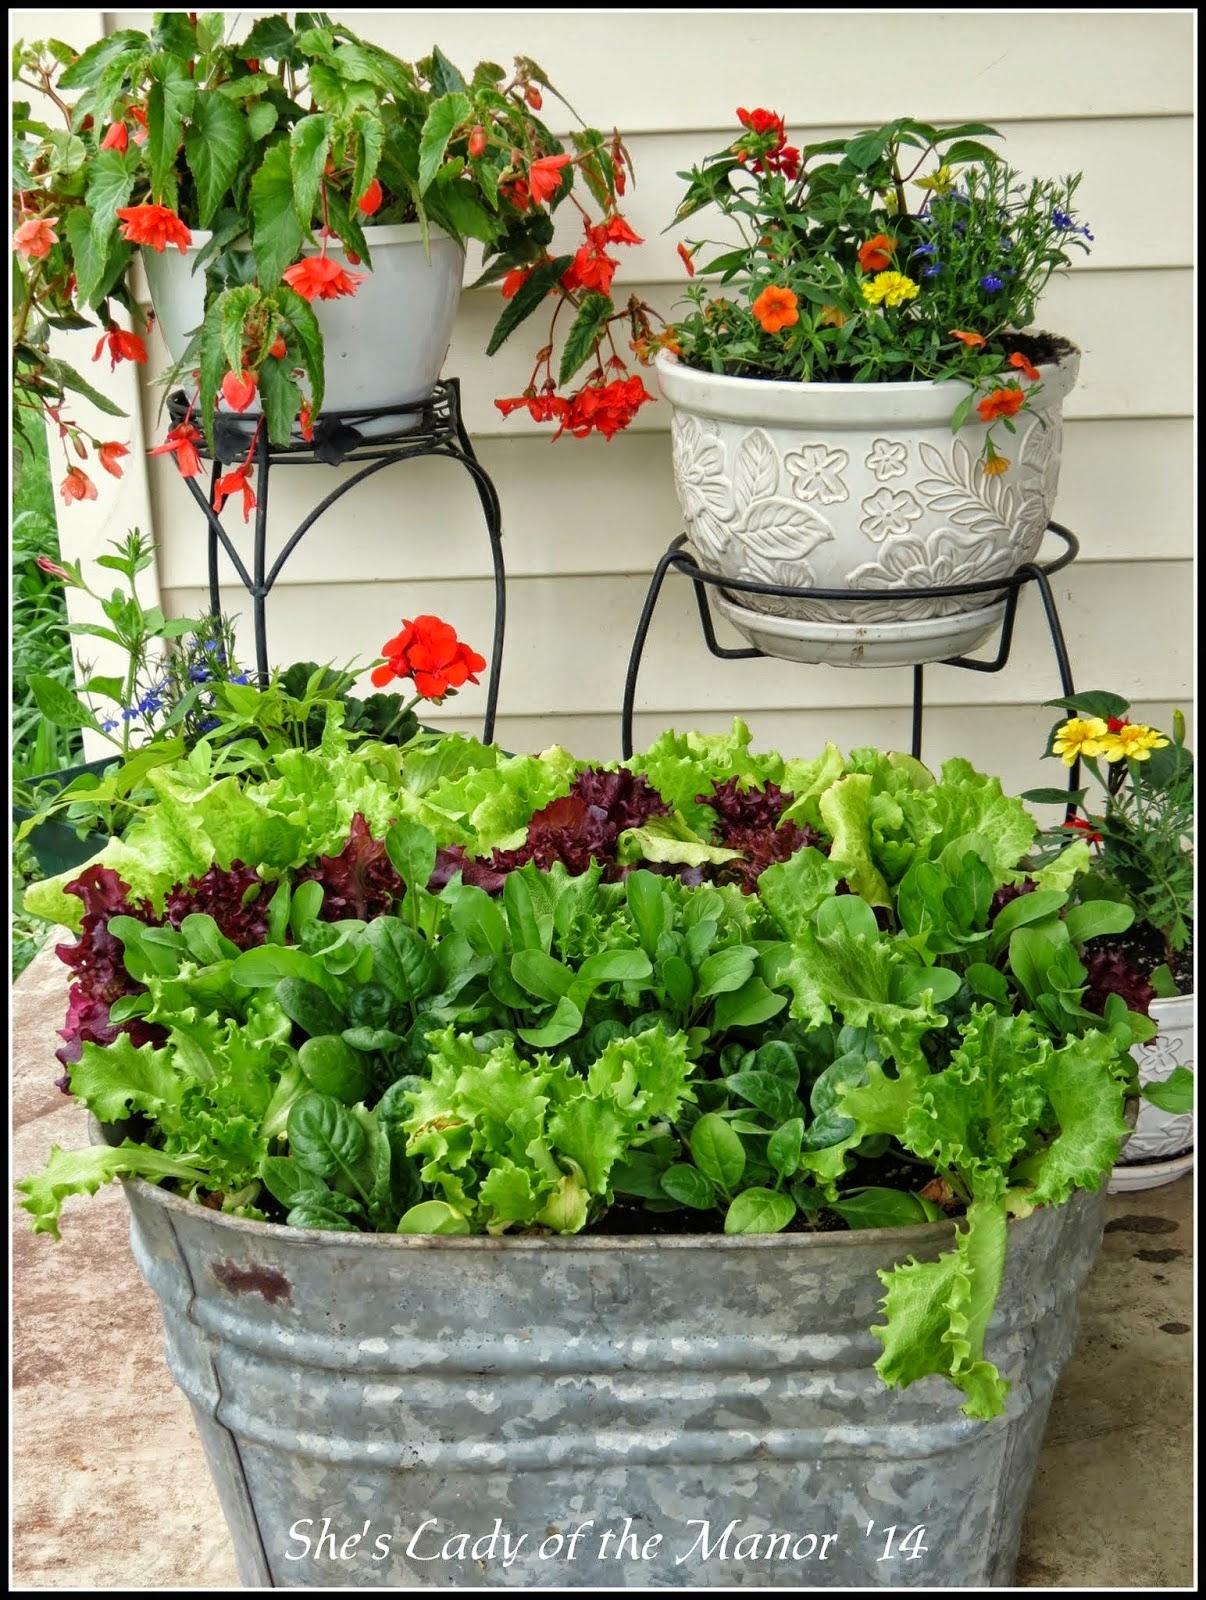 tub salad garden